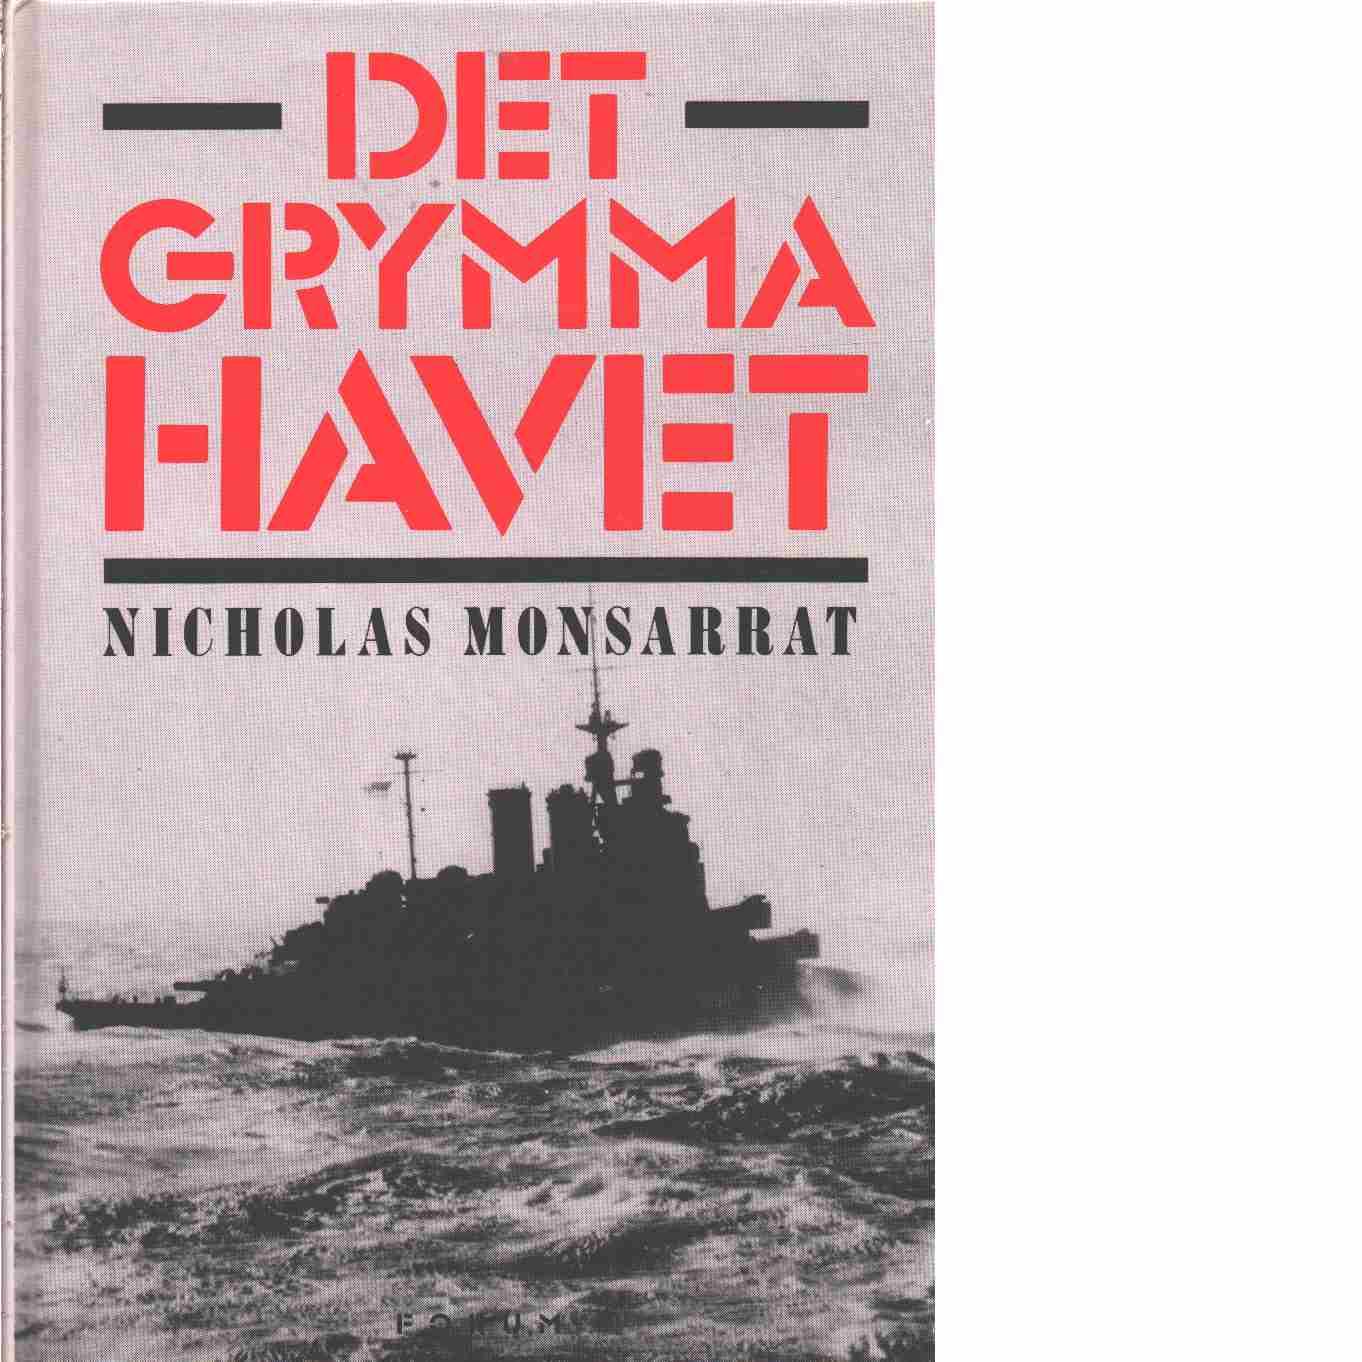 Det grymma havet - Monsarrat, Nicholas